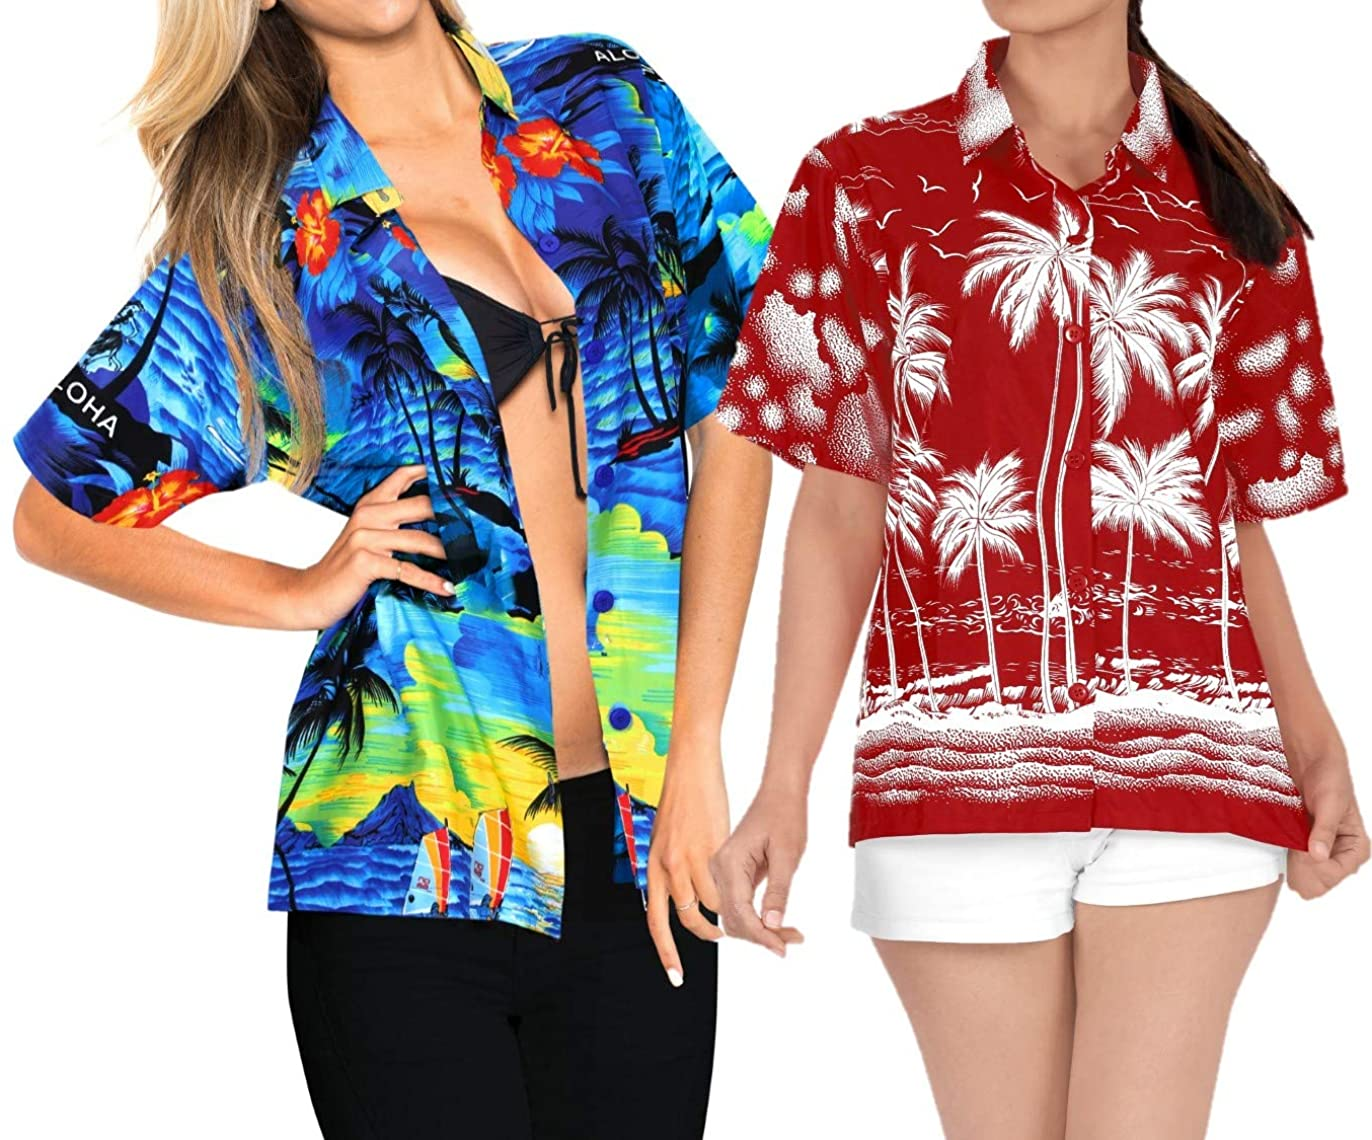 LA LEELA Women's Casual Button Down Beach Aloha Hawaiian Blouse Shirt Work from Home Clothes Women Beach Shirt Blouse Shirt Combo Pack of 2 Size S